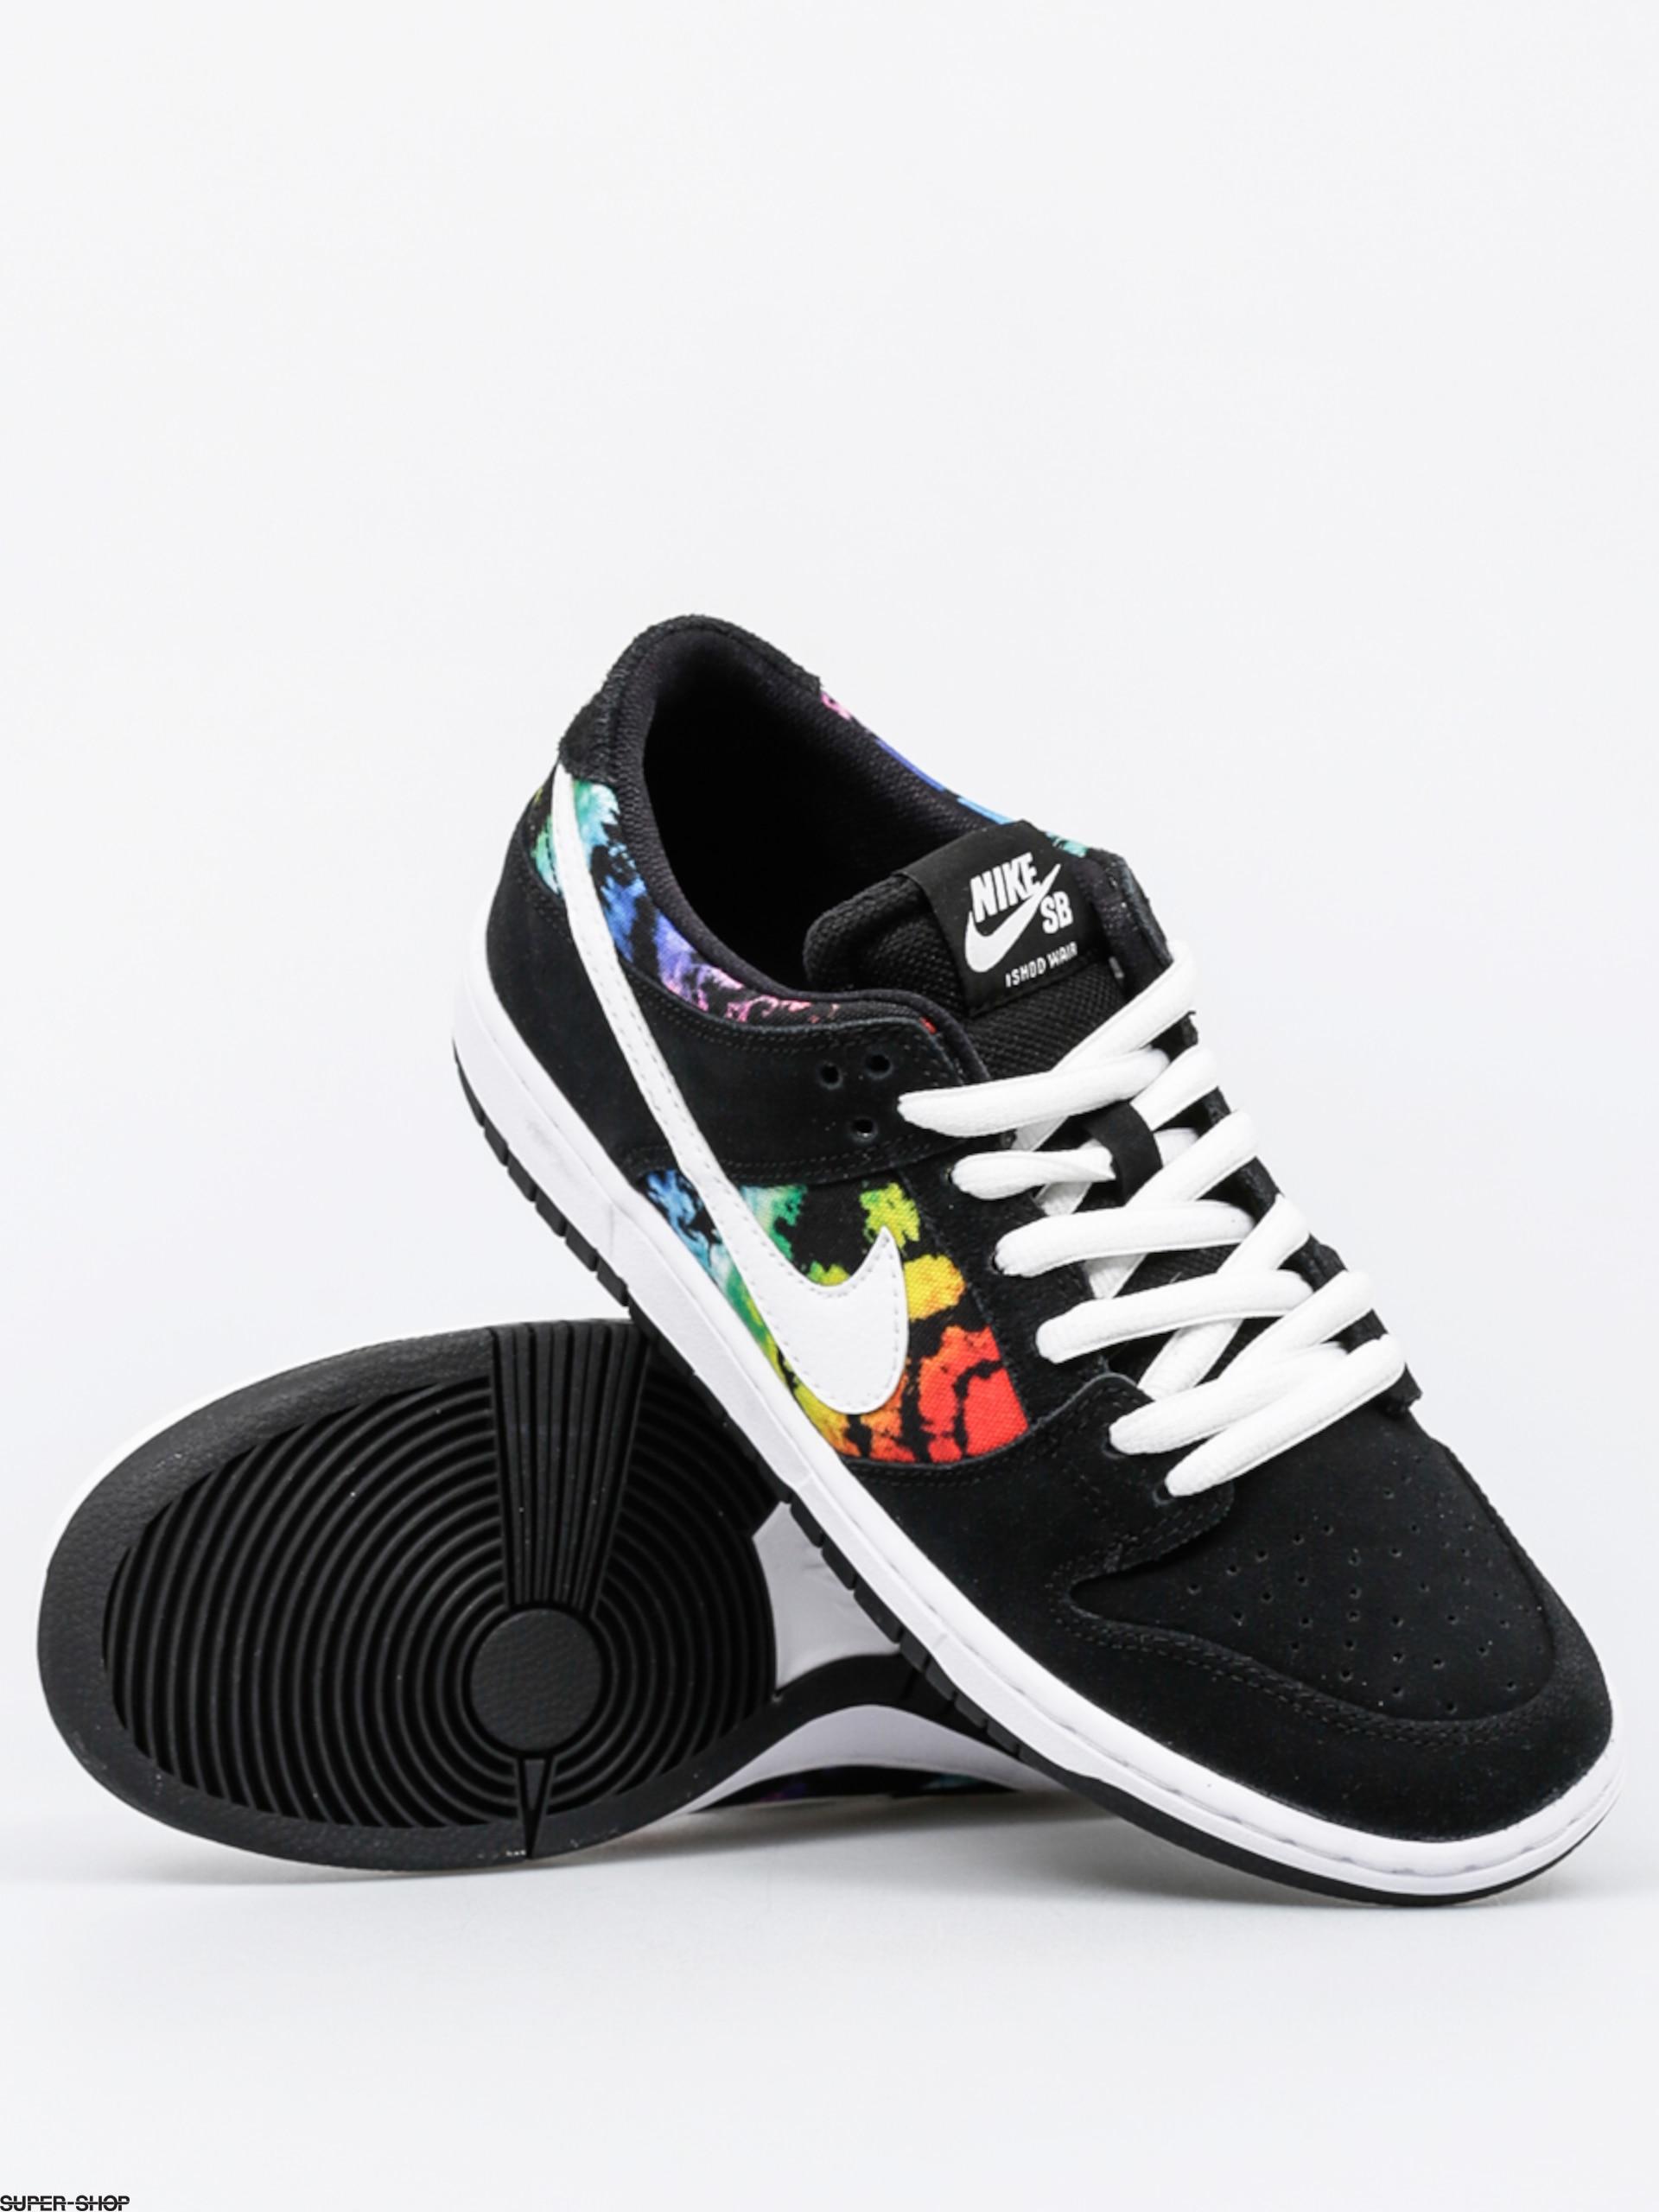 best authentic 80ddf 1fb1b Nike SB Shoes Dunk Low Pro Iw (black white multi color)